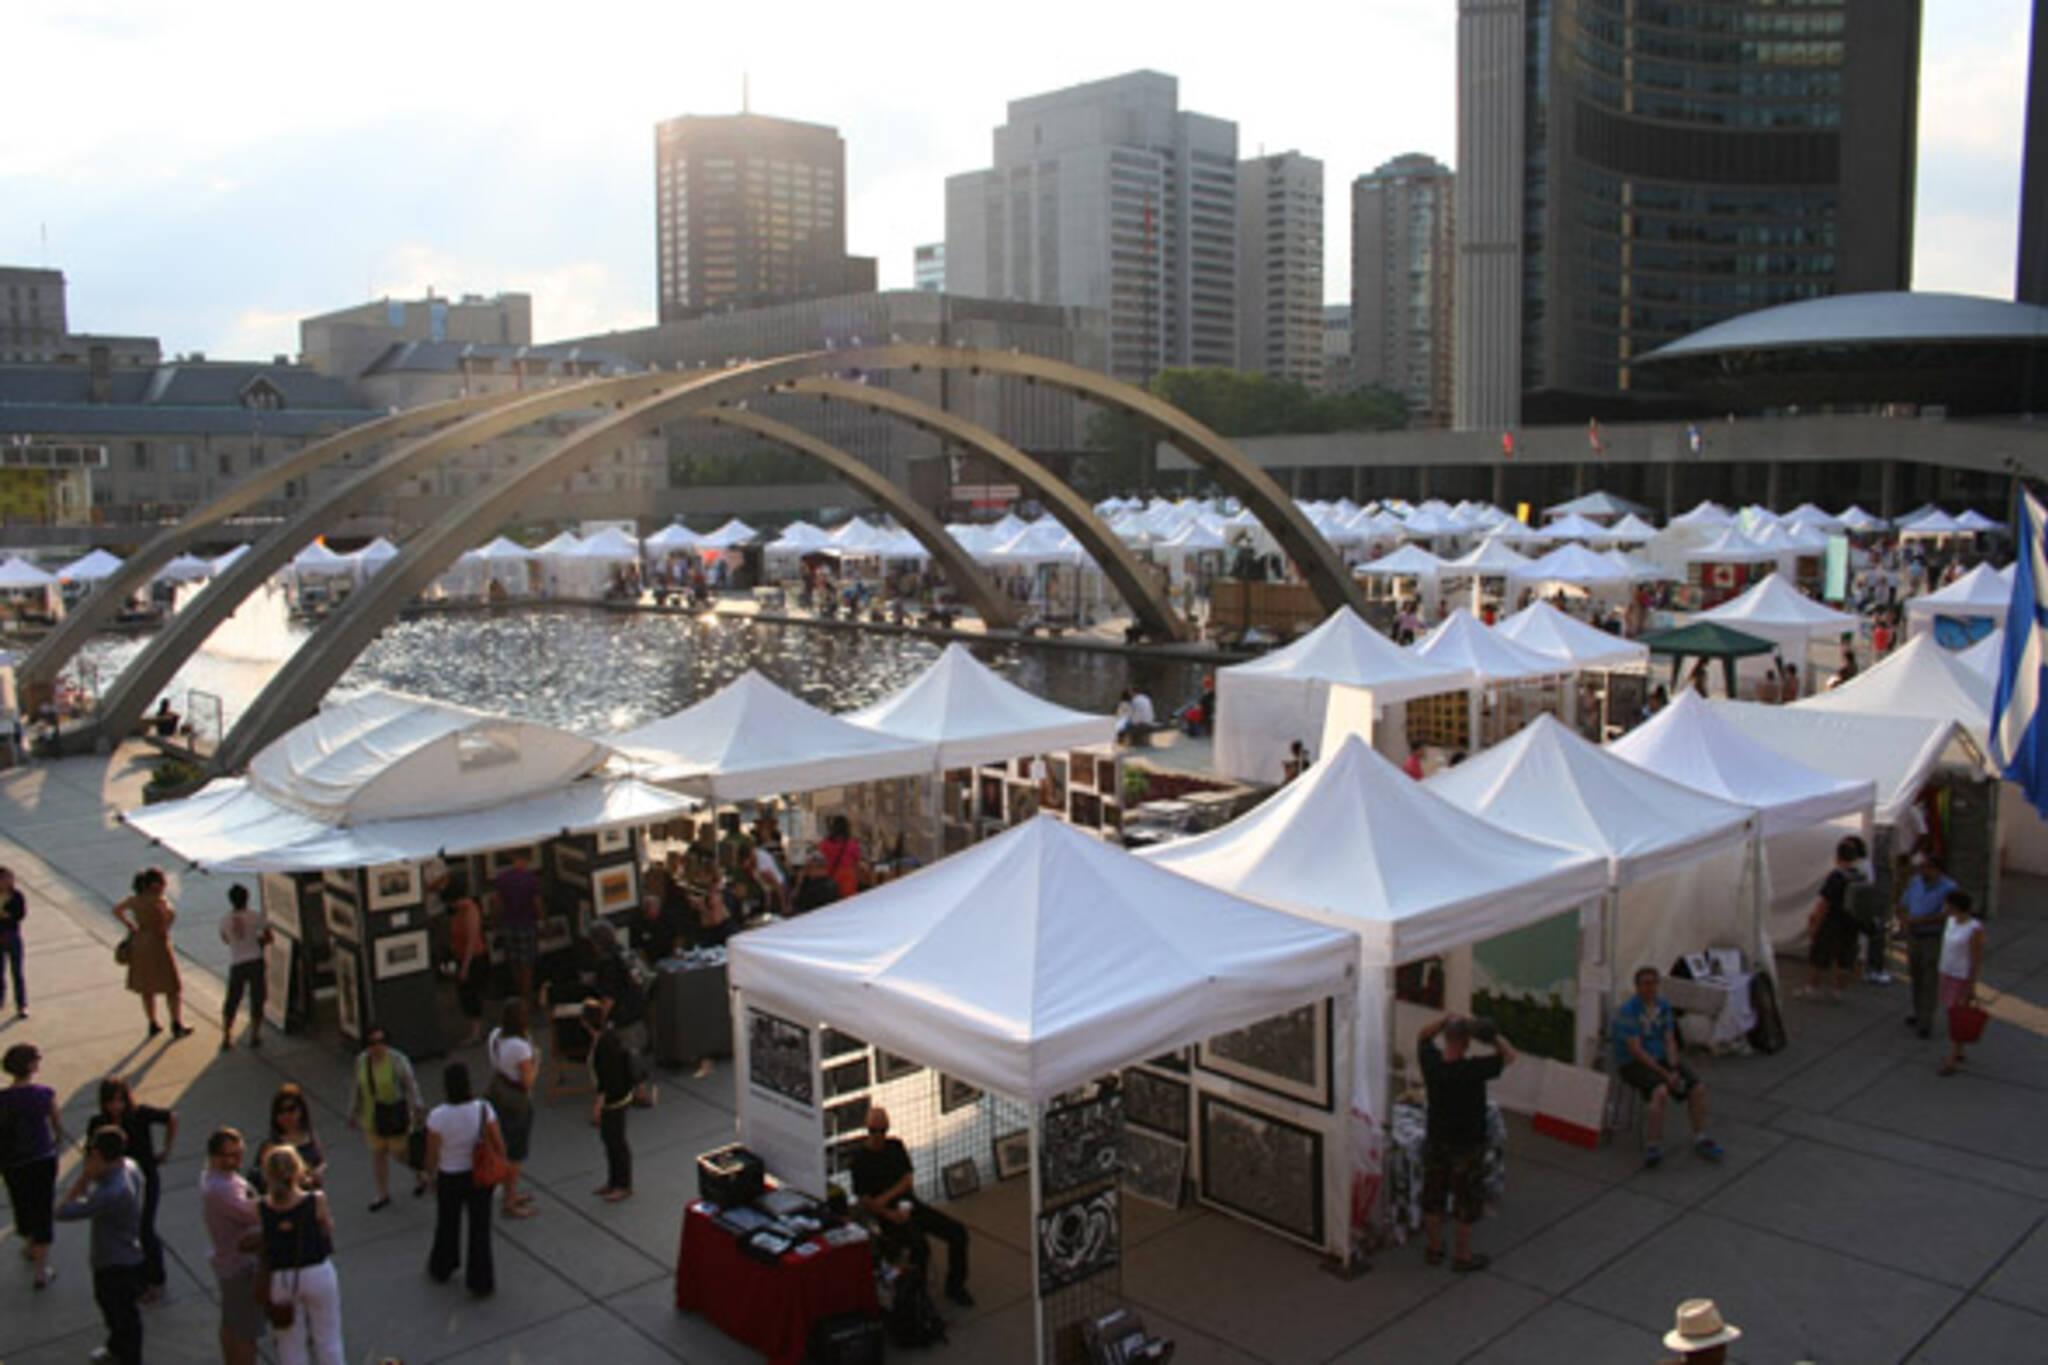 Toronto Outdoor Art Exhibition 2011